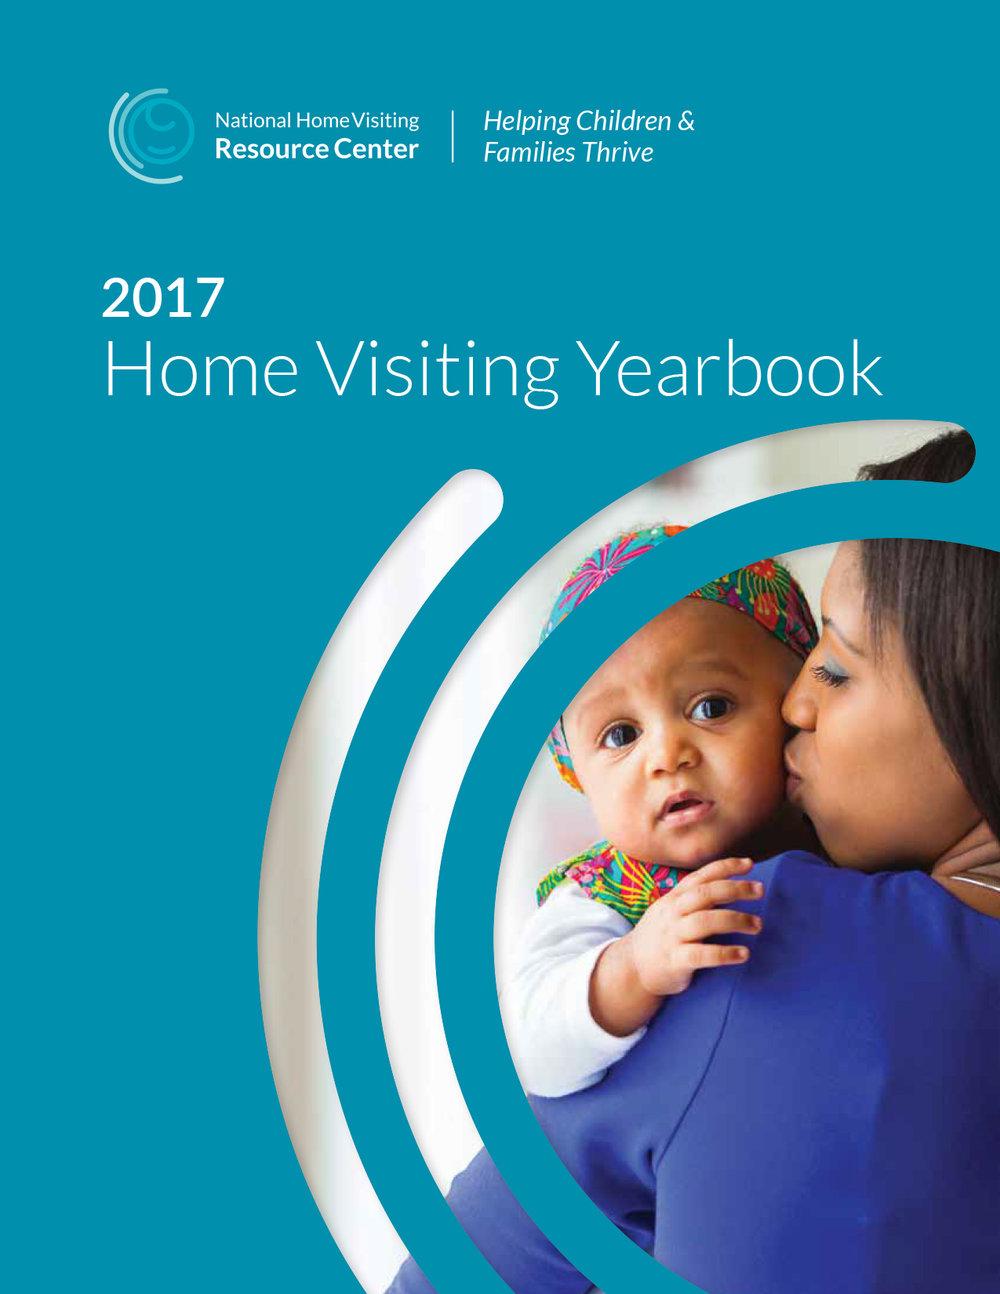 NHVRC 2017 Home Visiting Yearbook